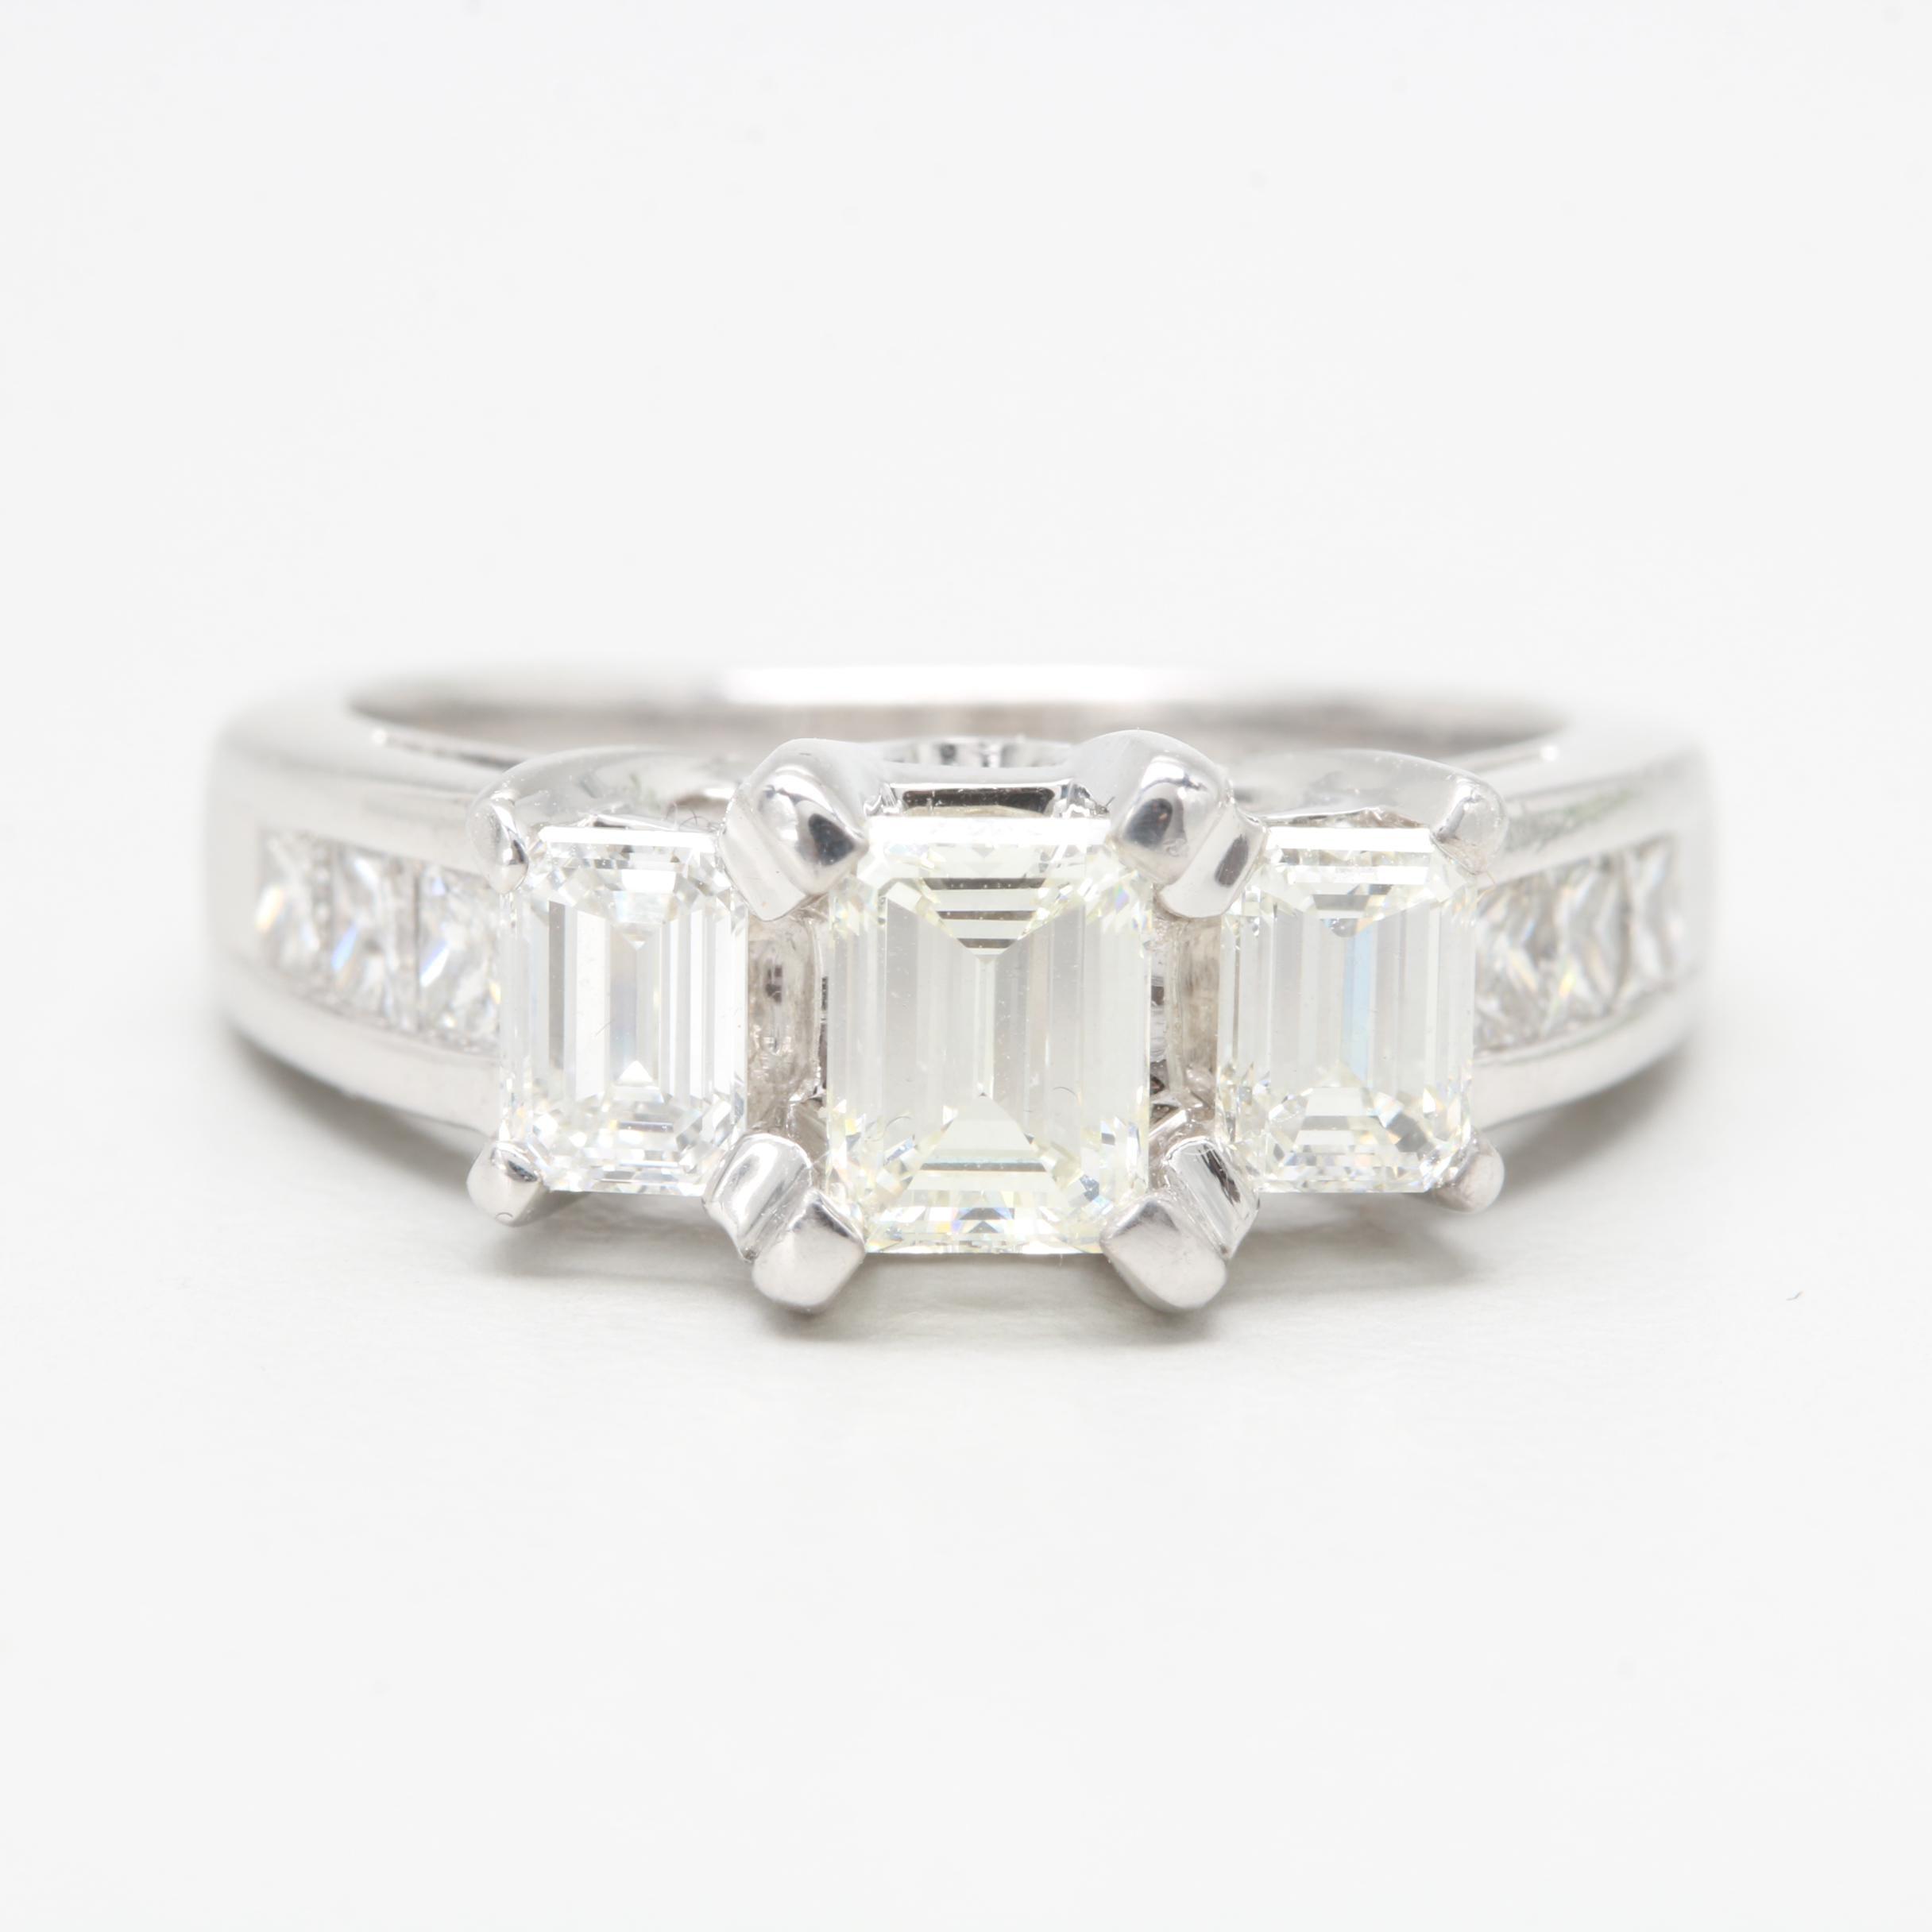 14K White Gold 2.11 CTW Diamond Ring